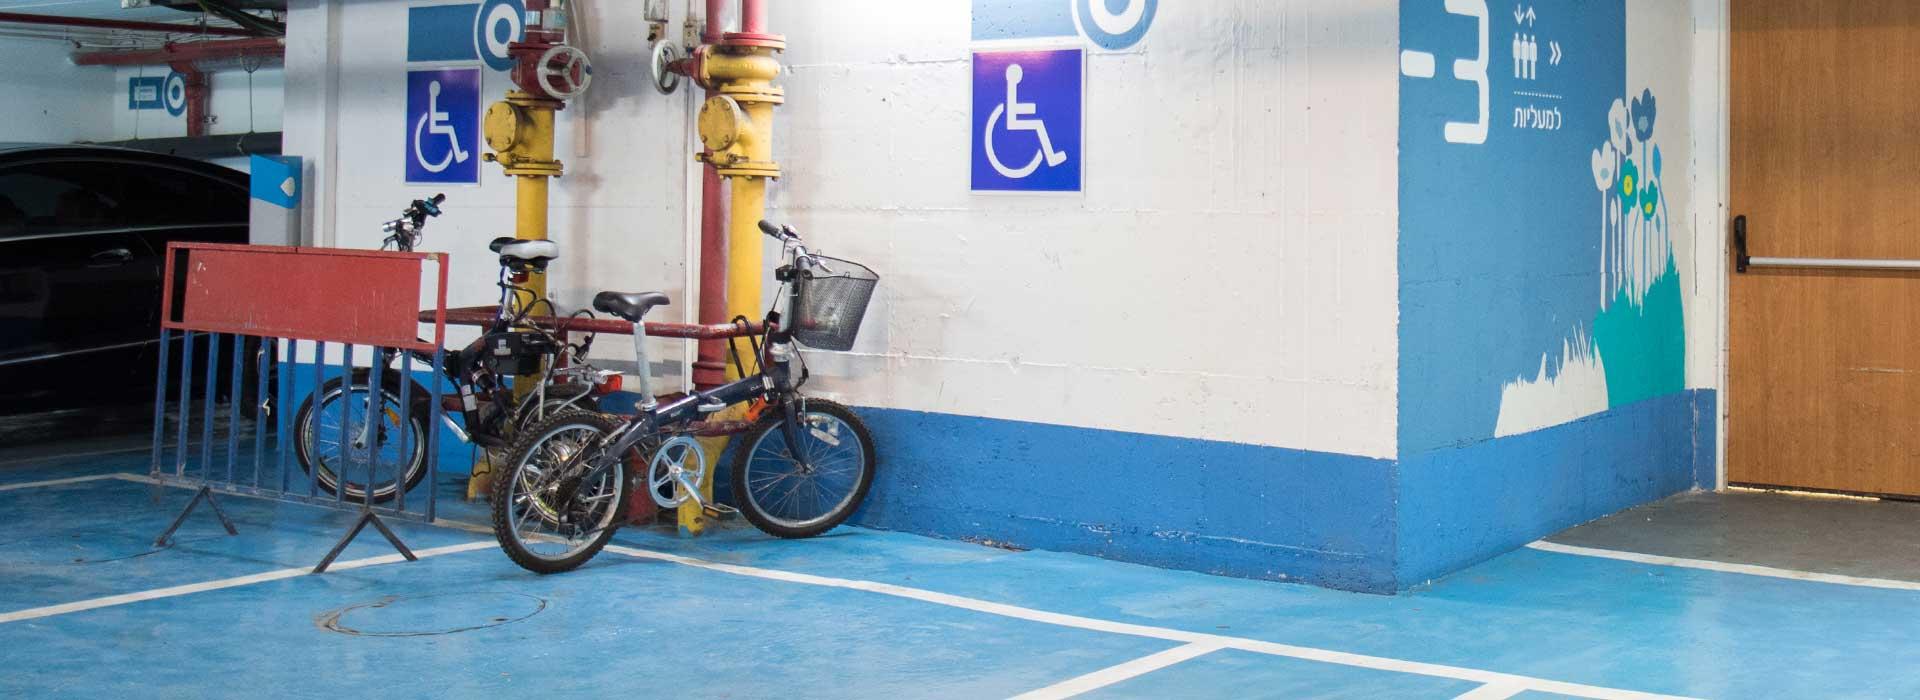 sliders-services-parking